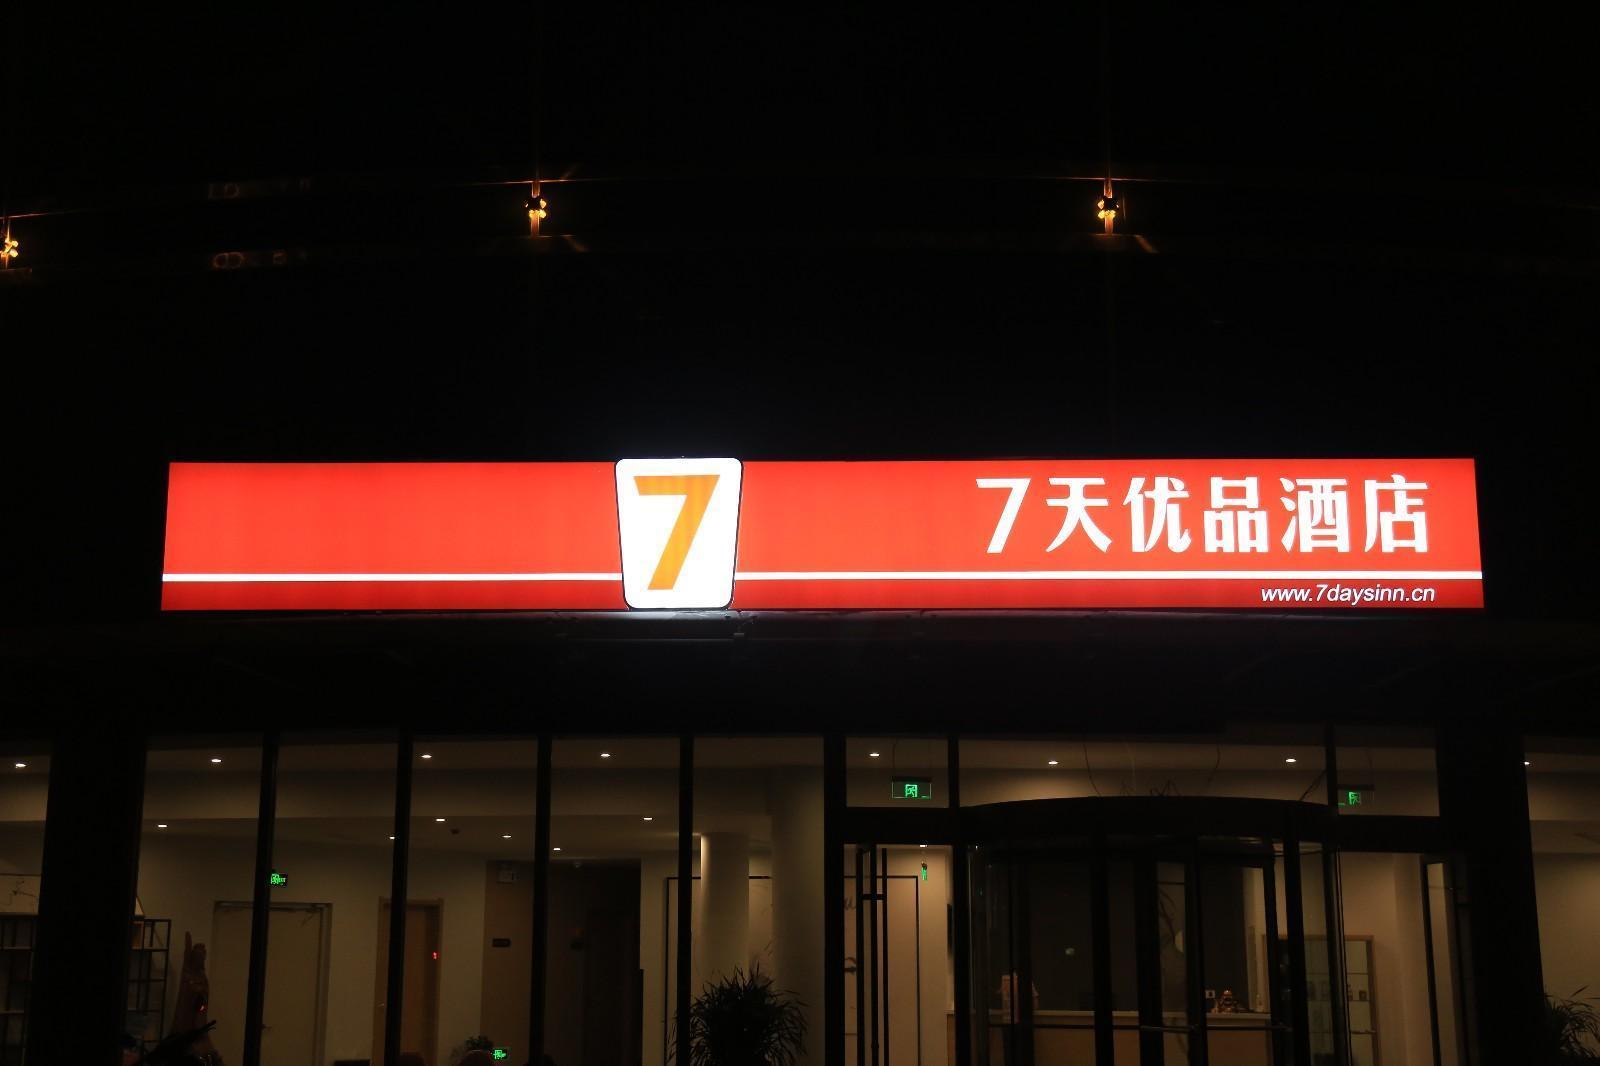 7 Days Premium·Yantai Penglai New Bus Terminal, Yantai